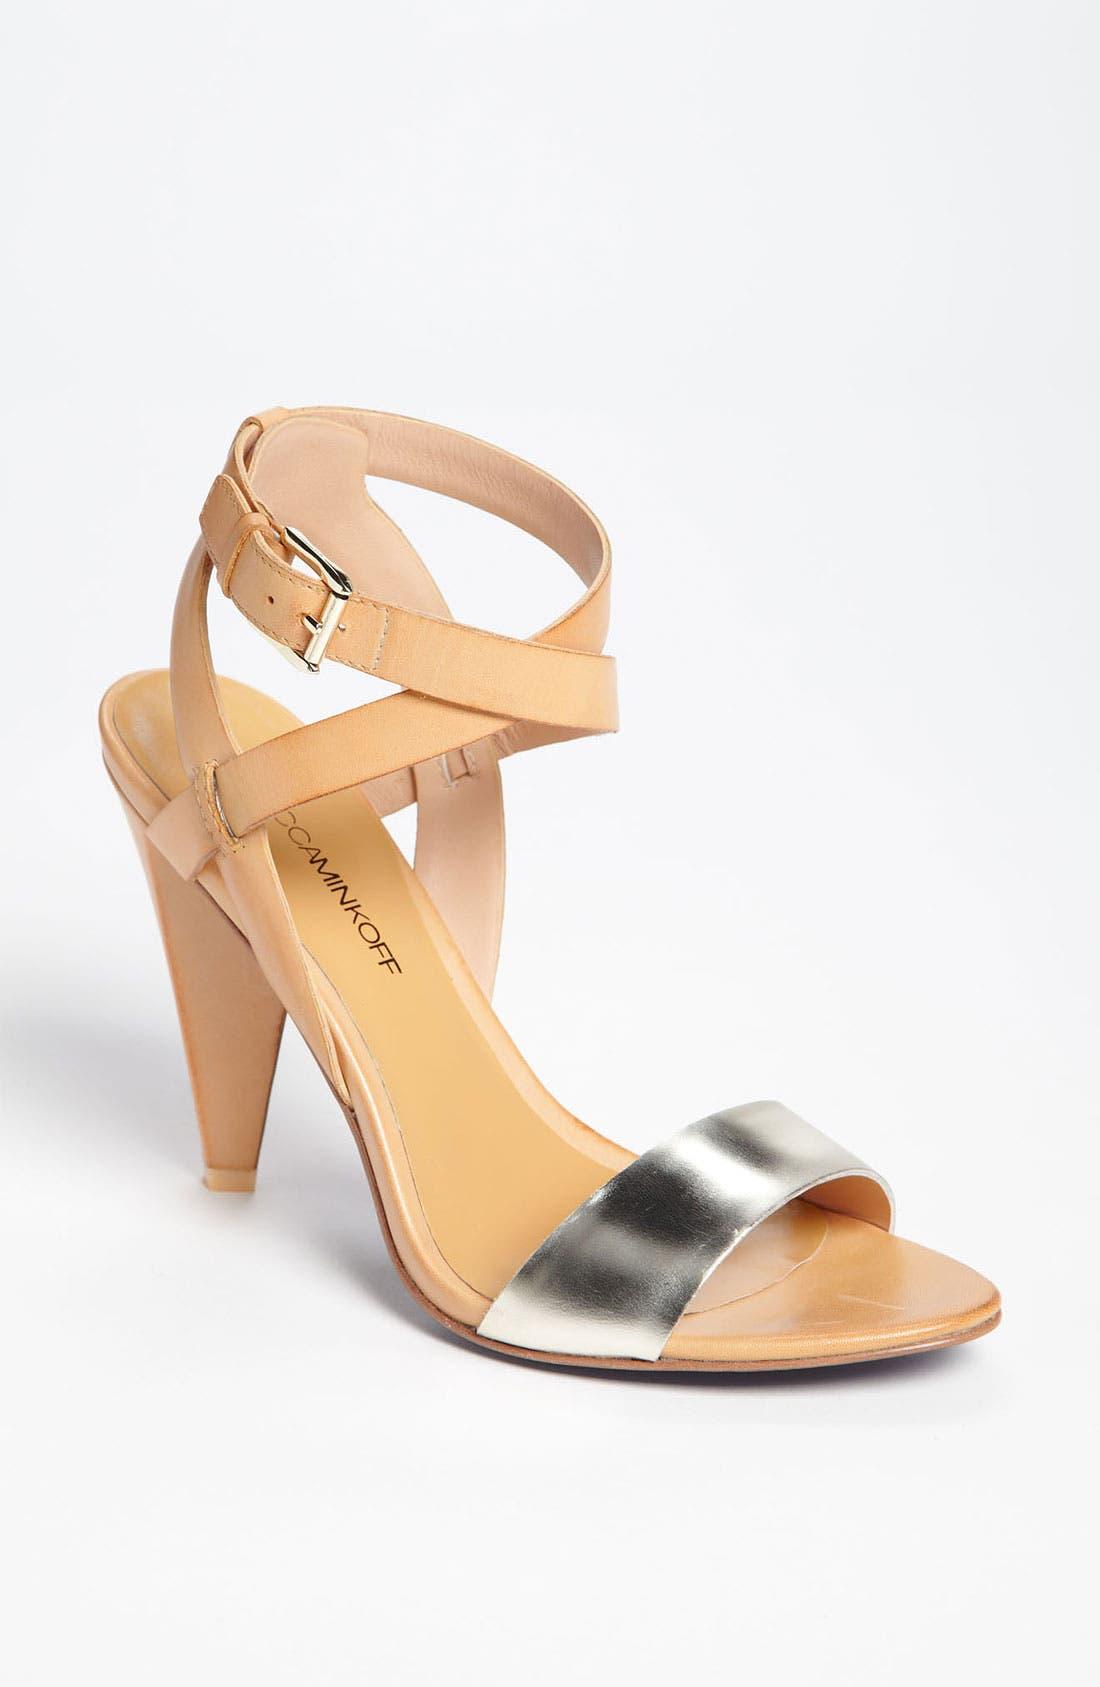 Alternate Image 1 Selected - Rebecca Minkoff 'Marsha' Sandal